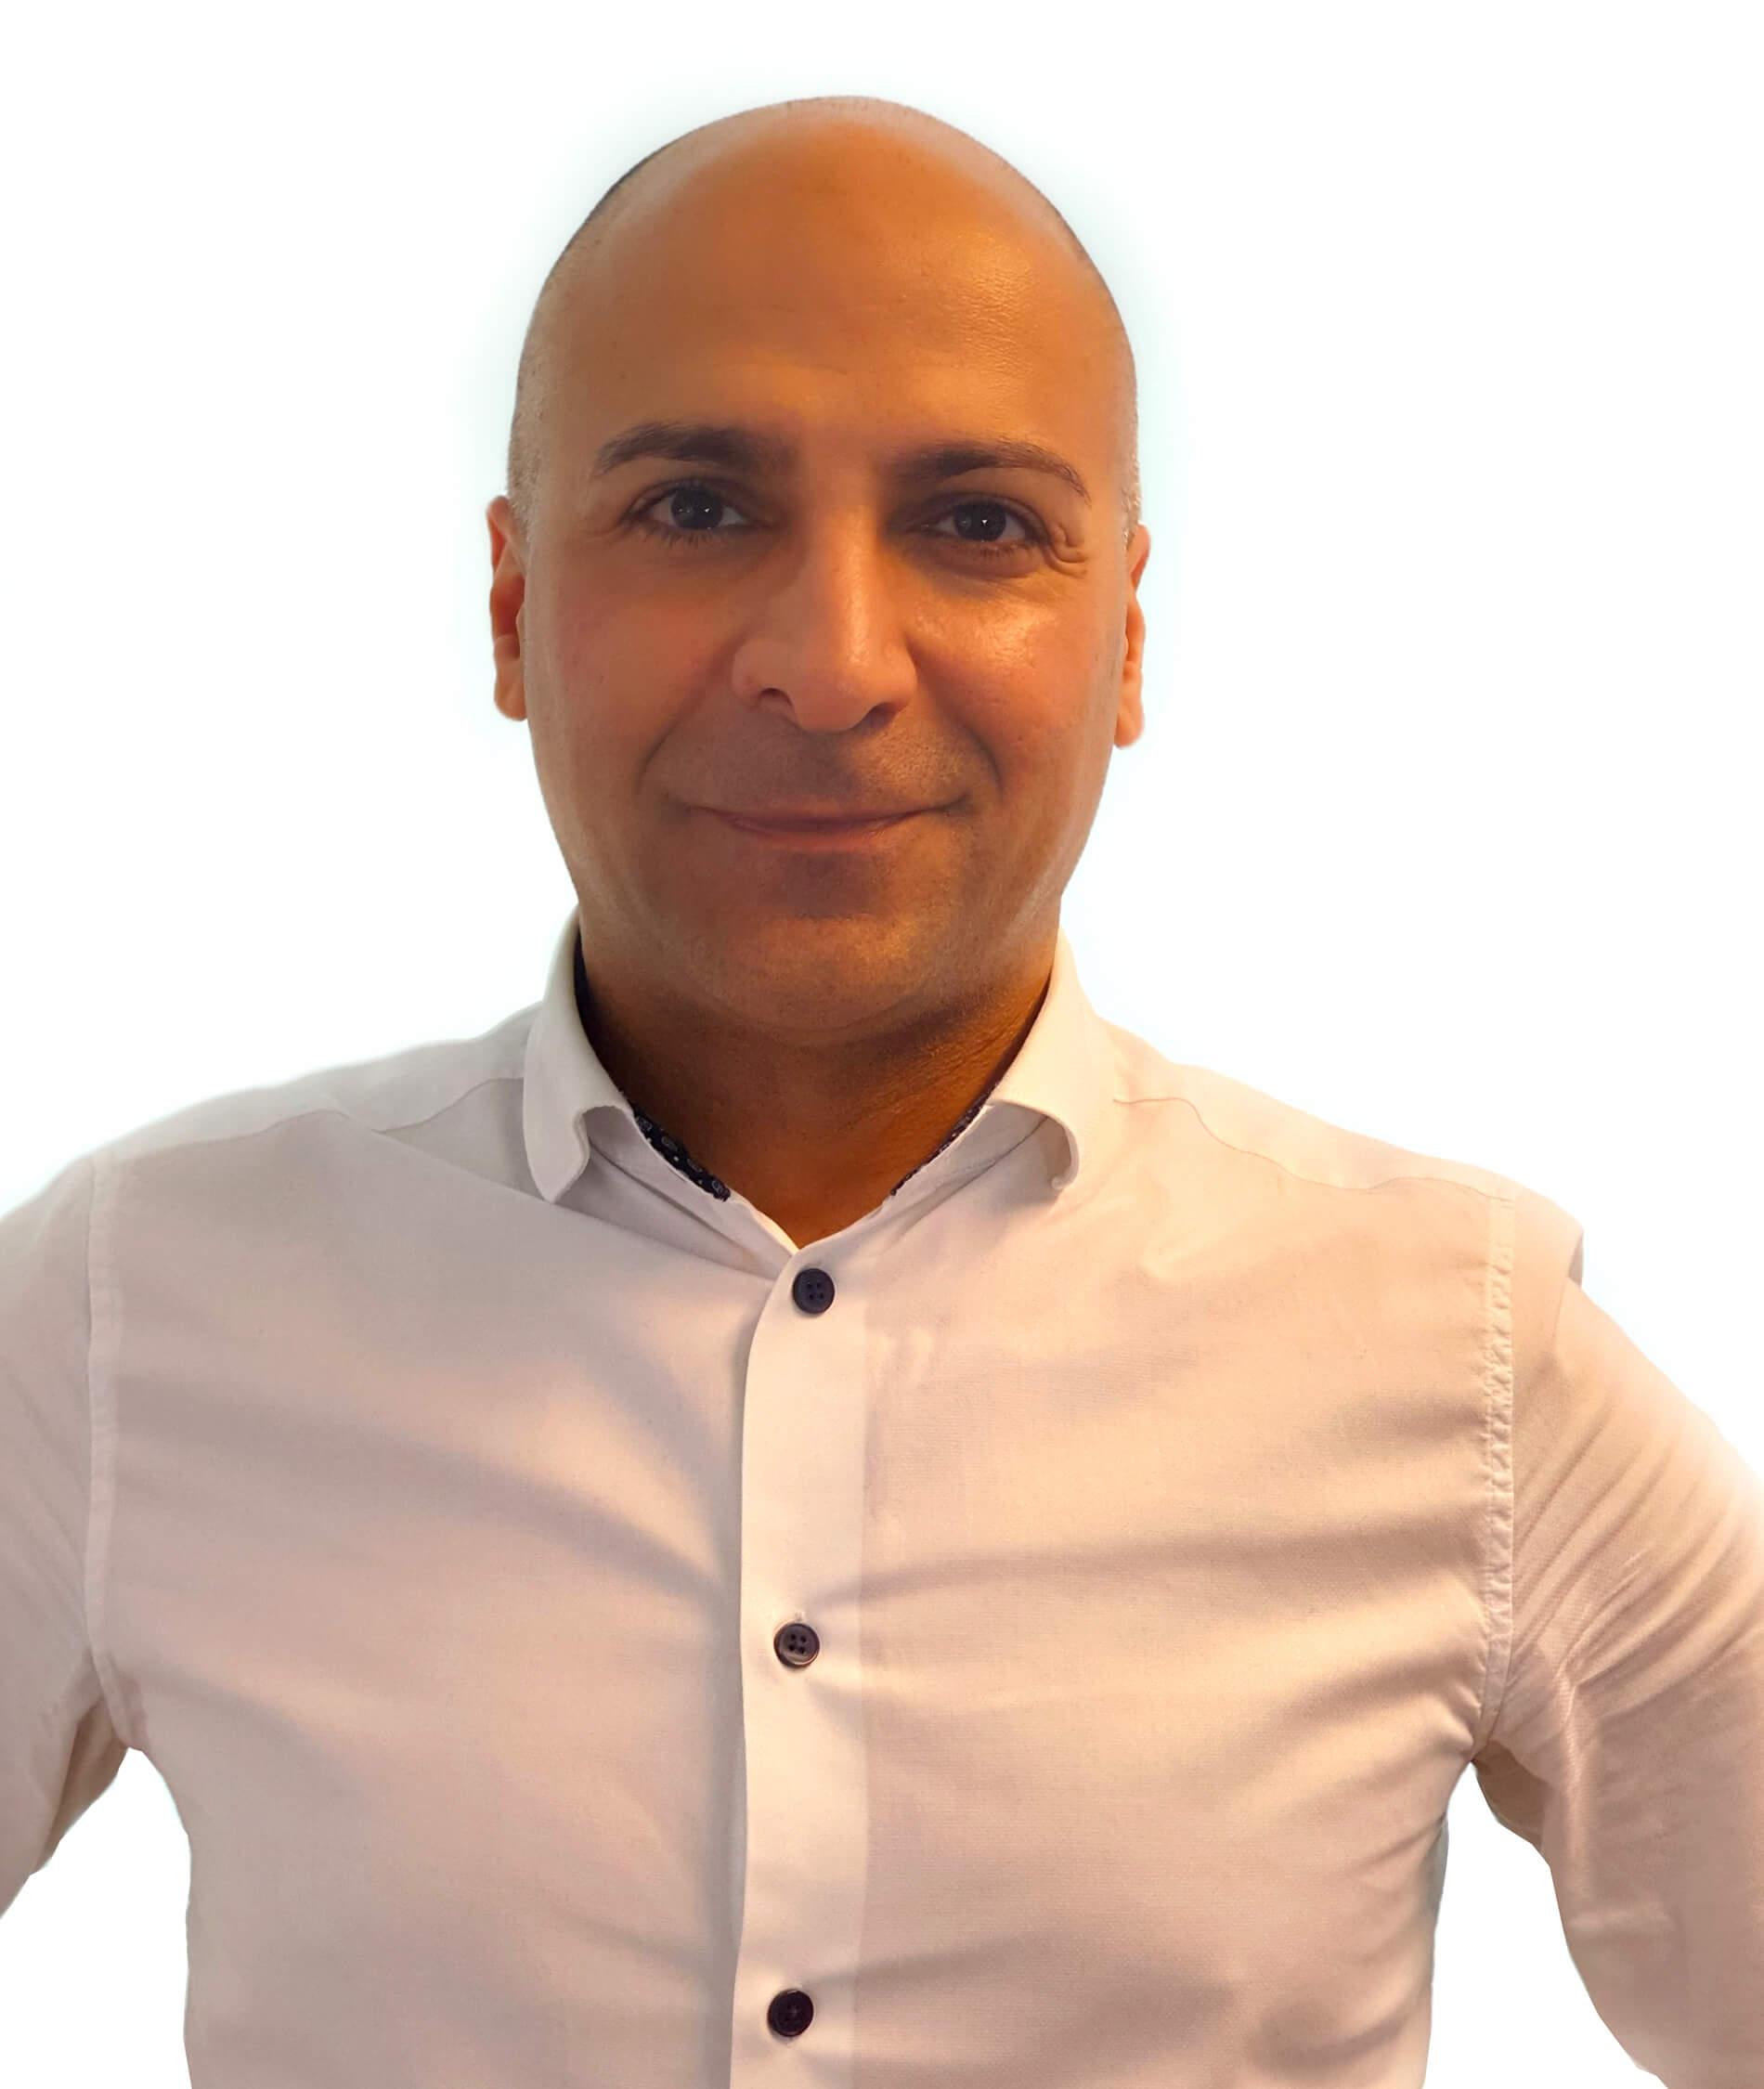 Amir Zamirian